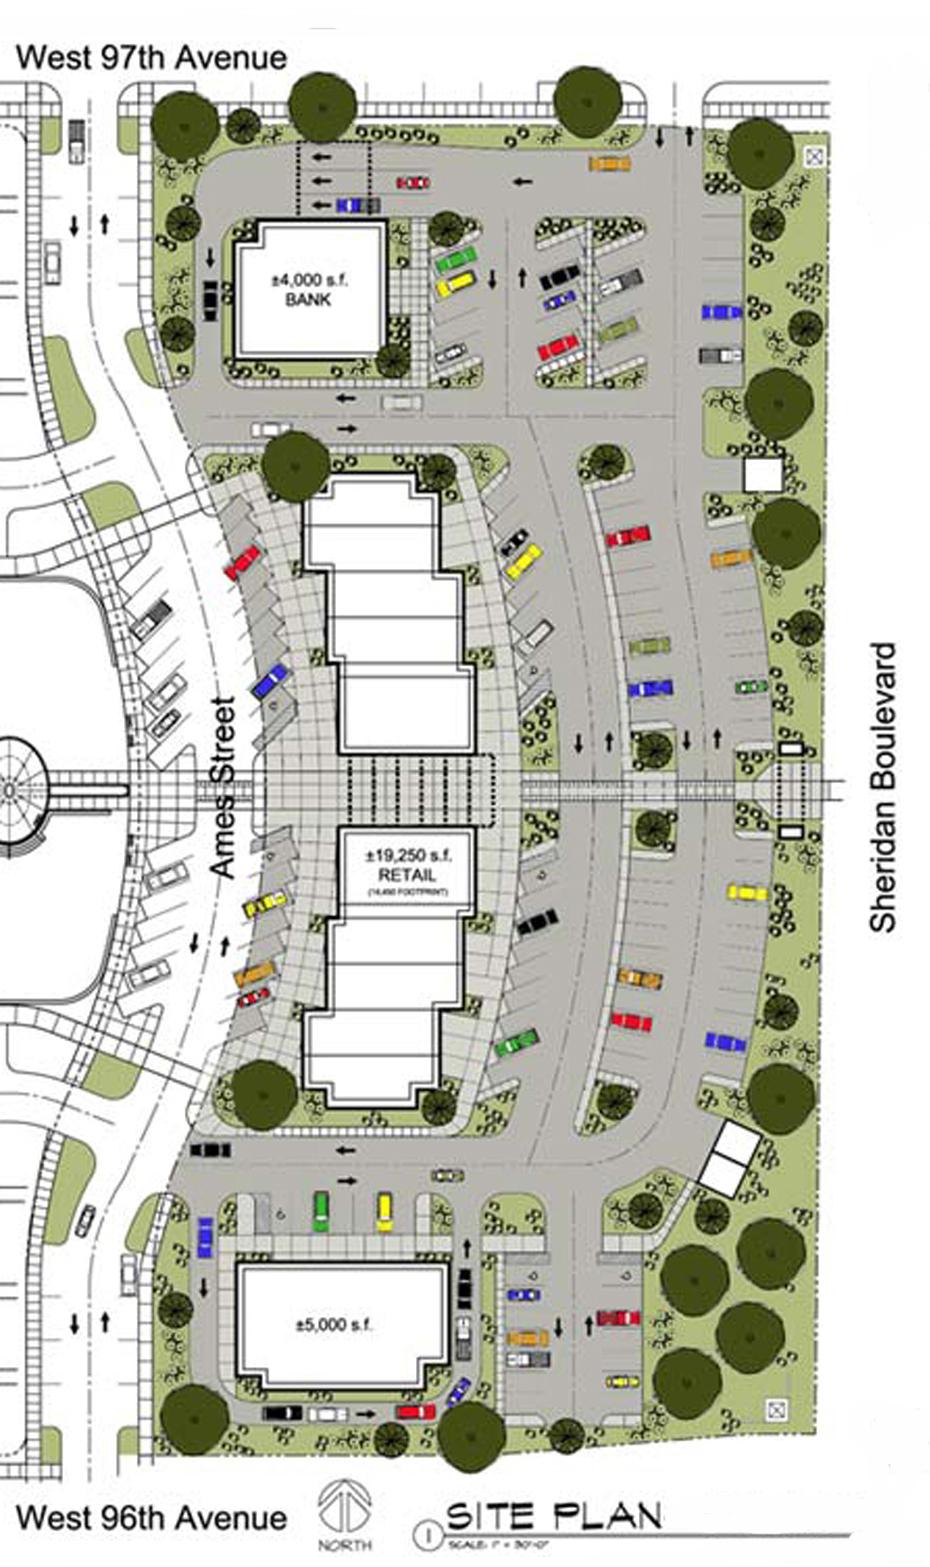 hiland Village site plan - cropped.jpg